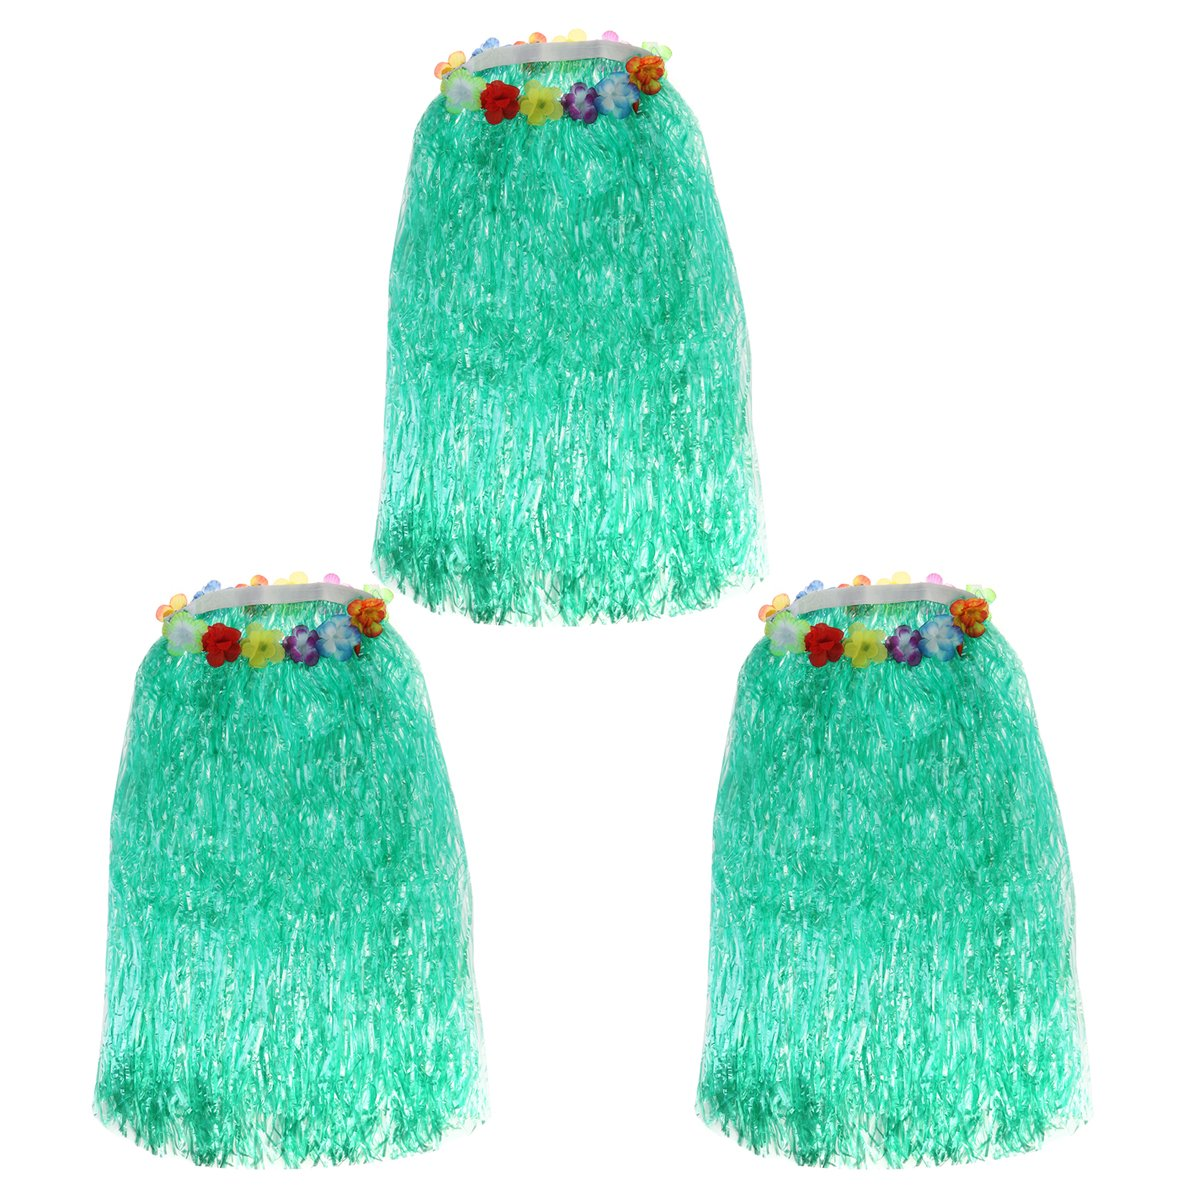 Tinksky 3pcs Hawaiian Grass Dance Skirt for Beach Luau Party Decoration, gift for women Adults 80cm (Green)